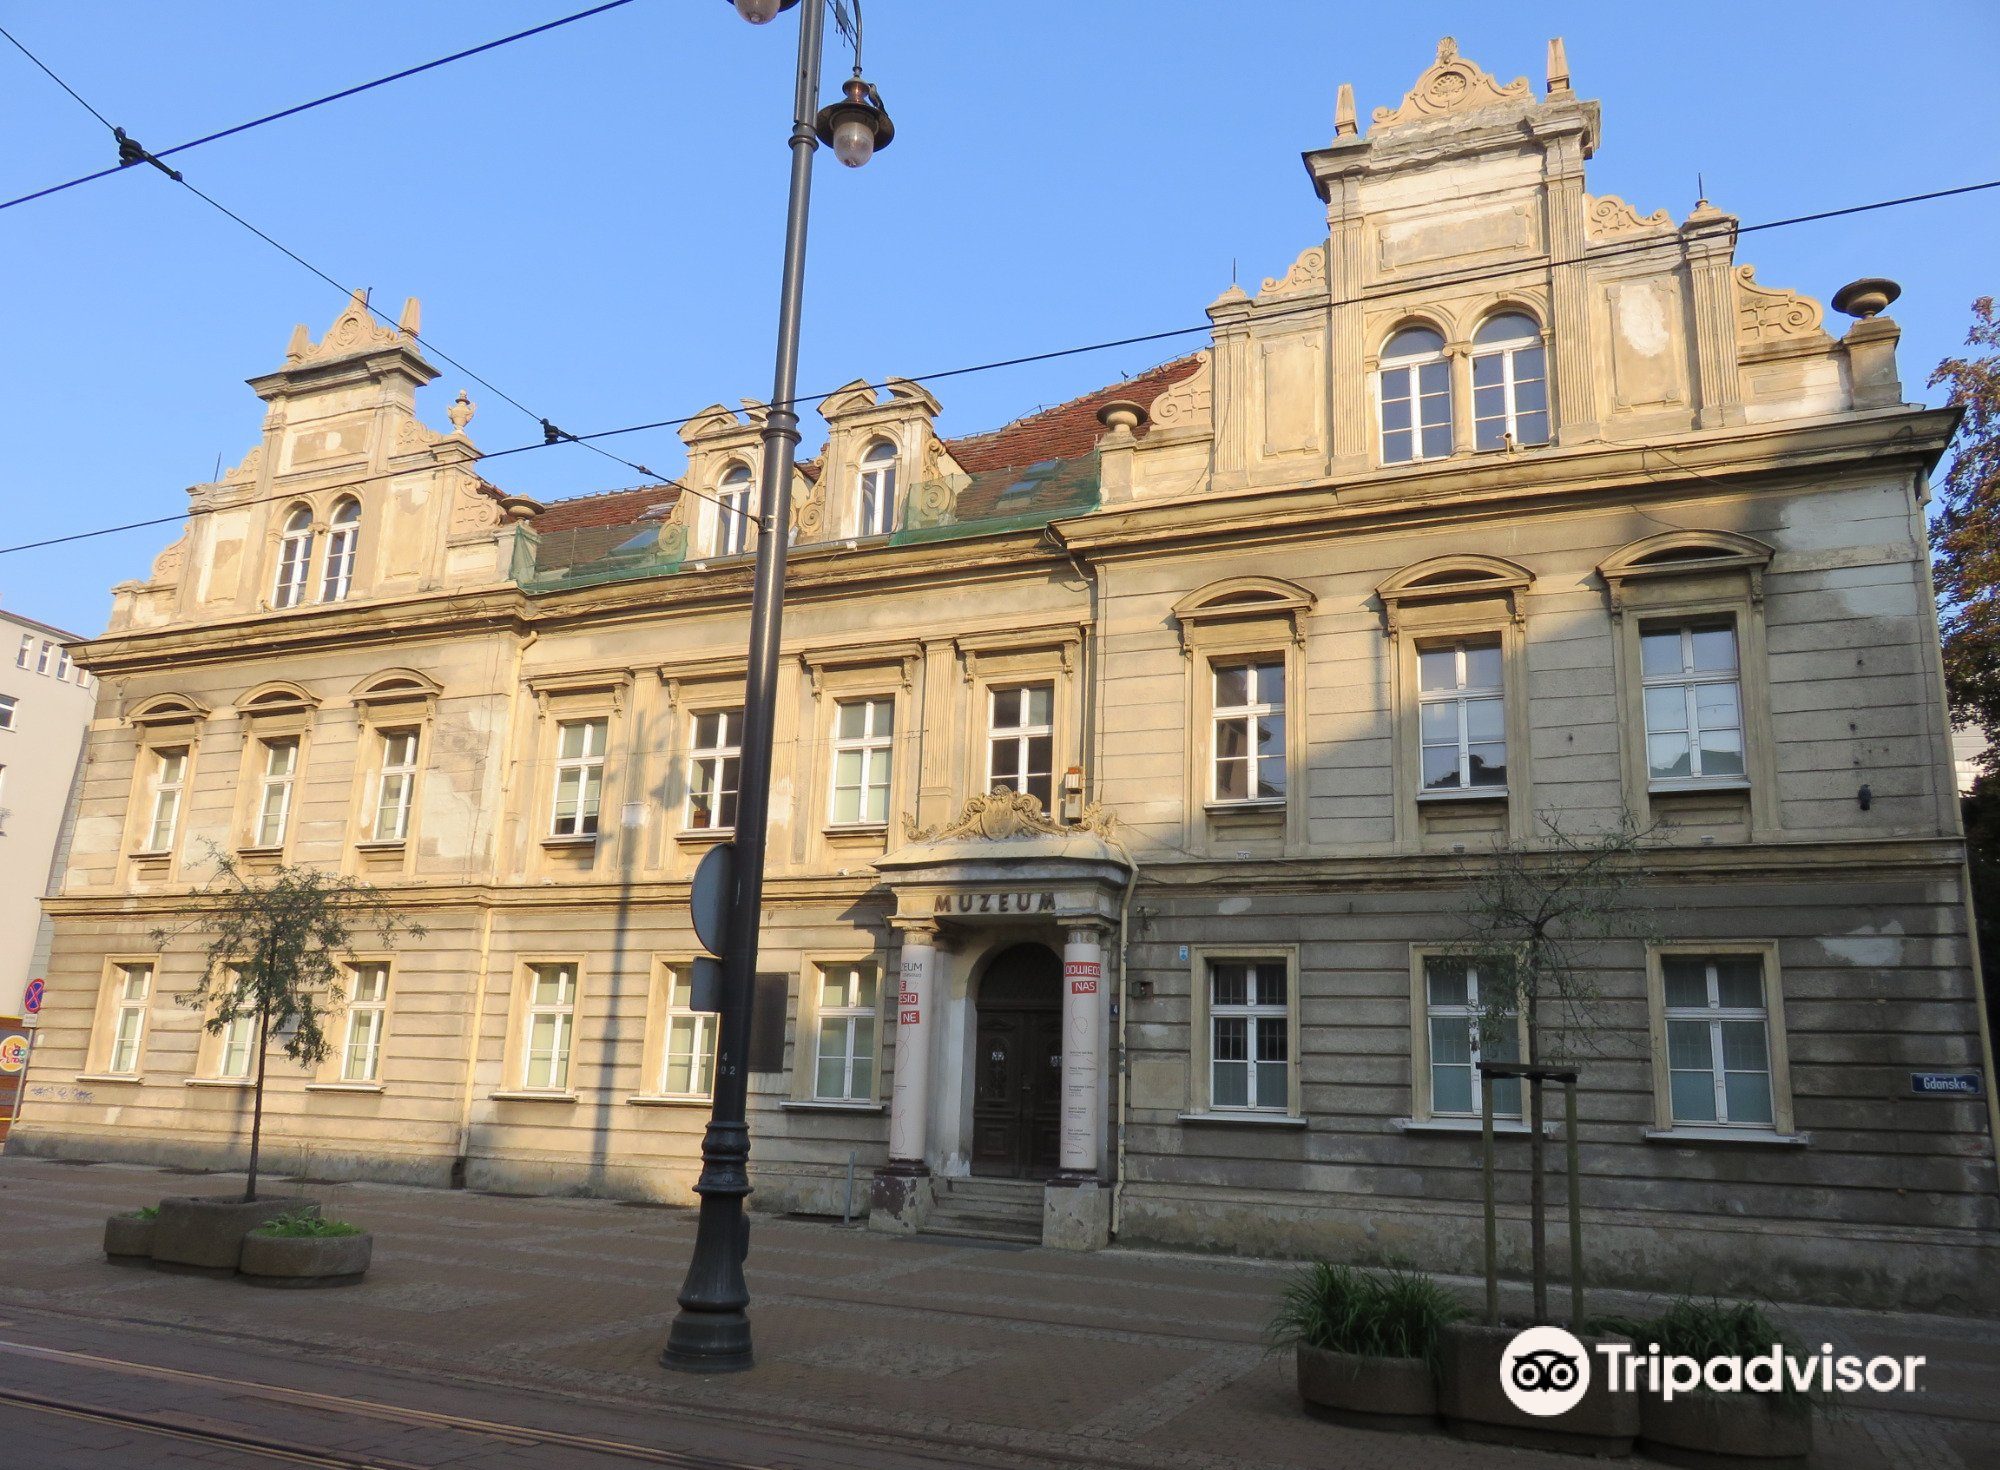 The Leon Wyczolkowski District Museum